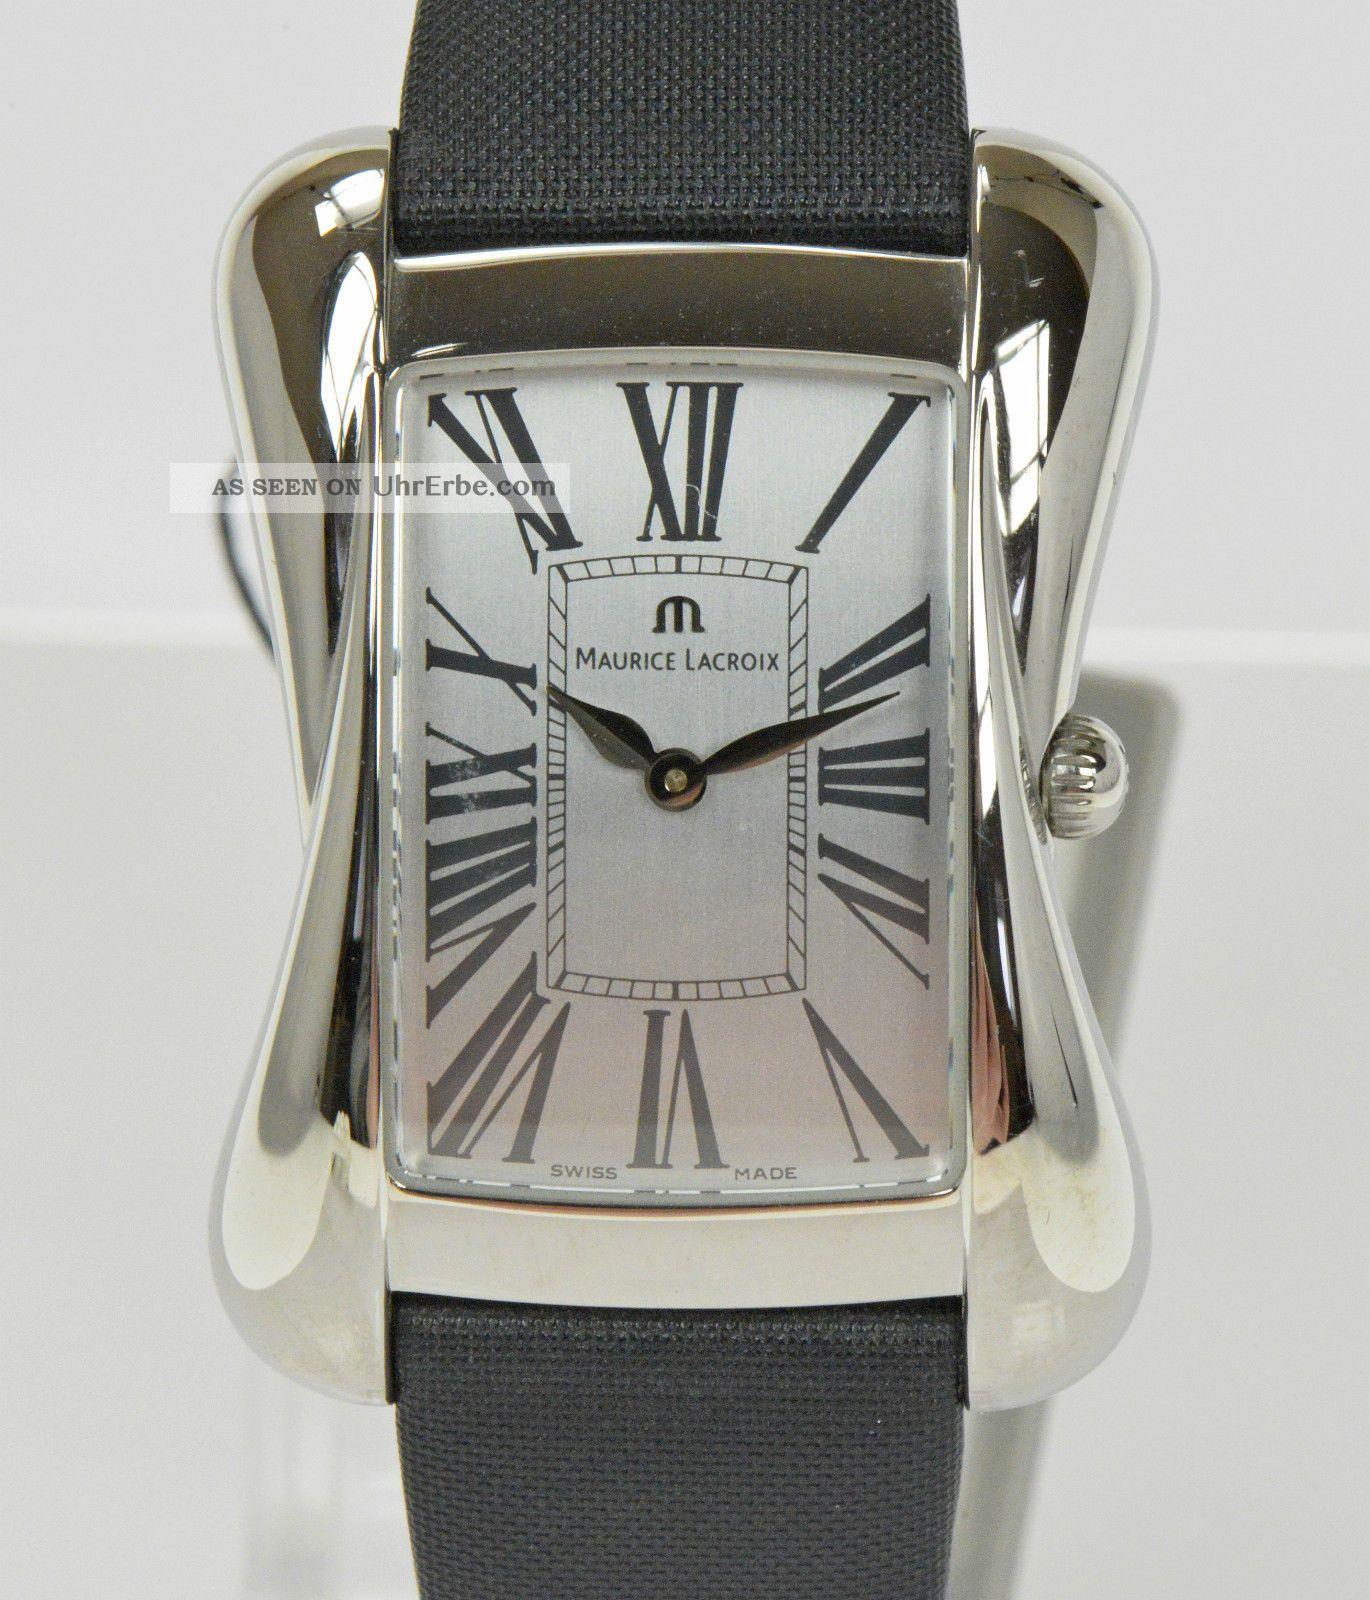 Maurice Lacroix Damenuhr Edelstahl Devina Uhr Luxusuhr Armbanduhr Nr.  1459 Armbanduhren Bild